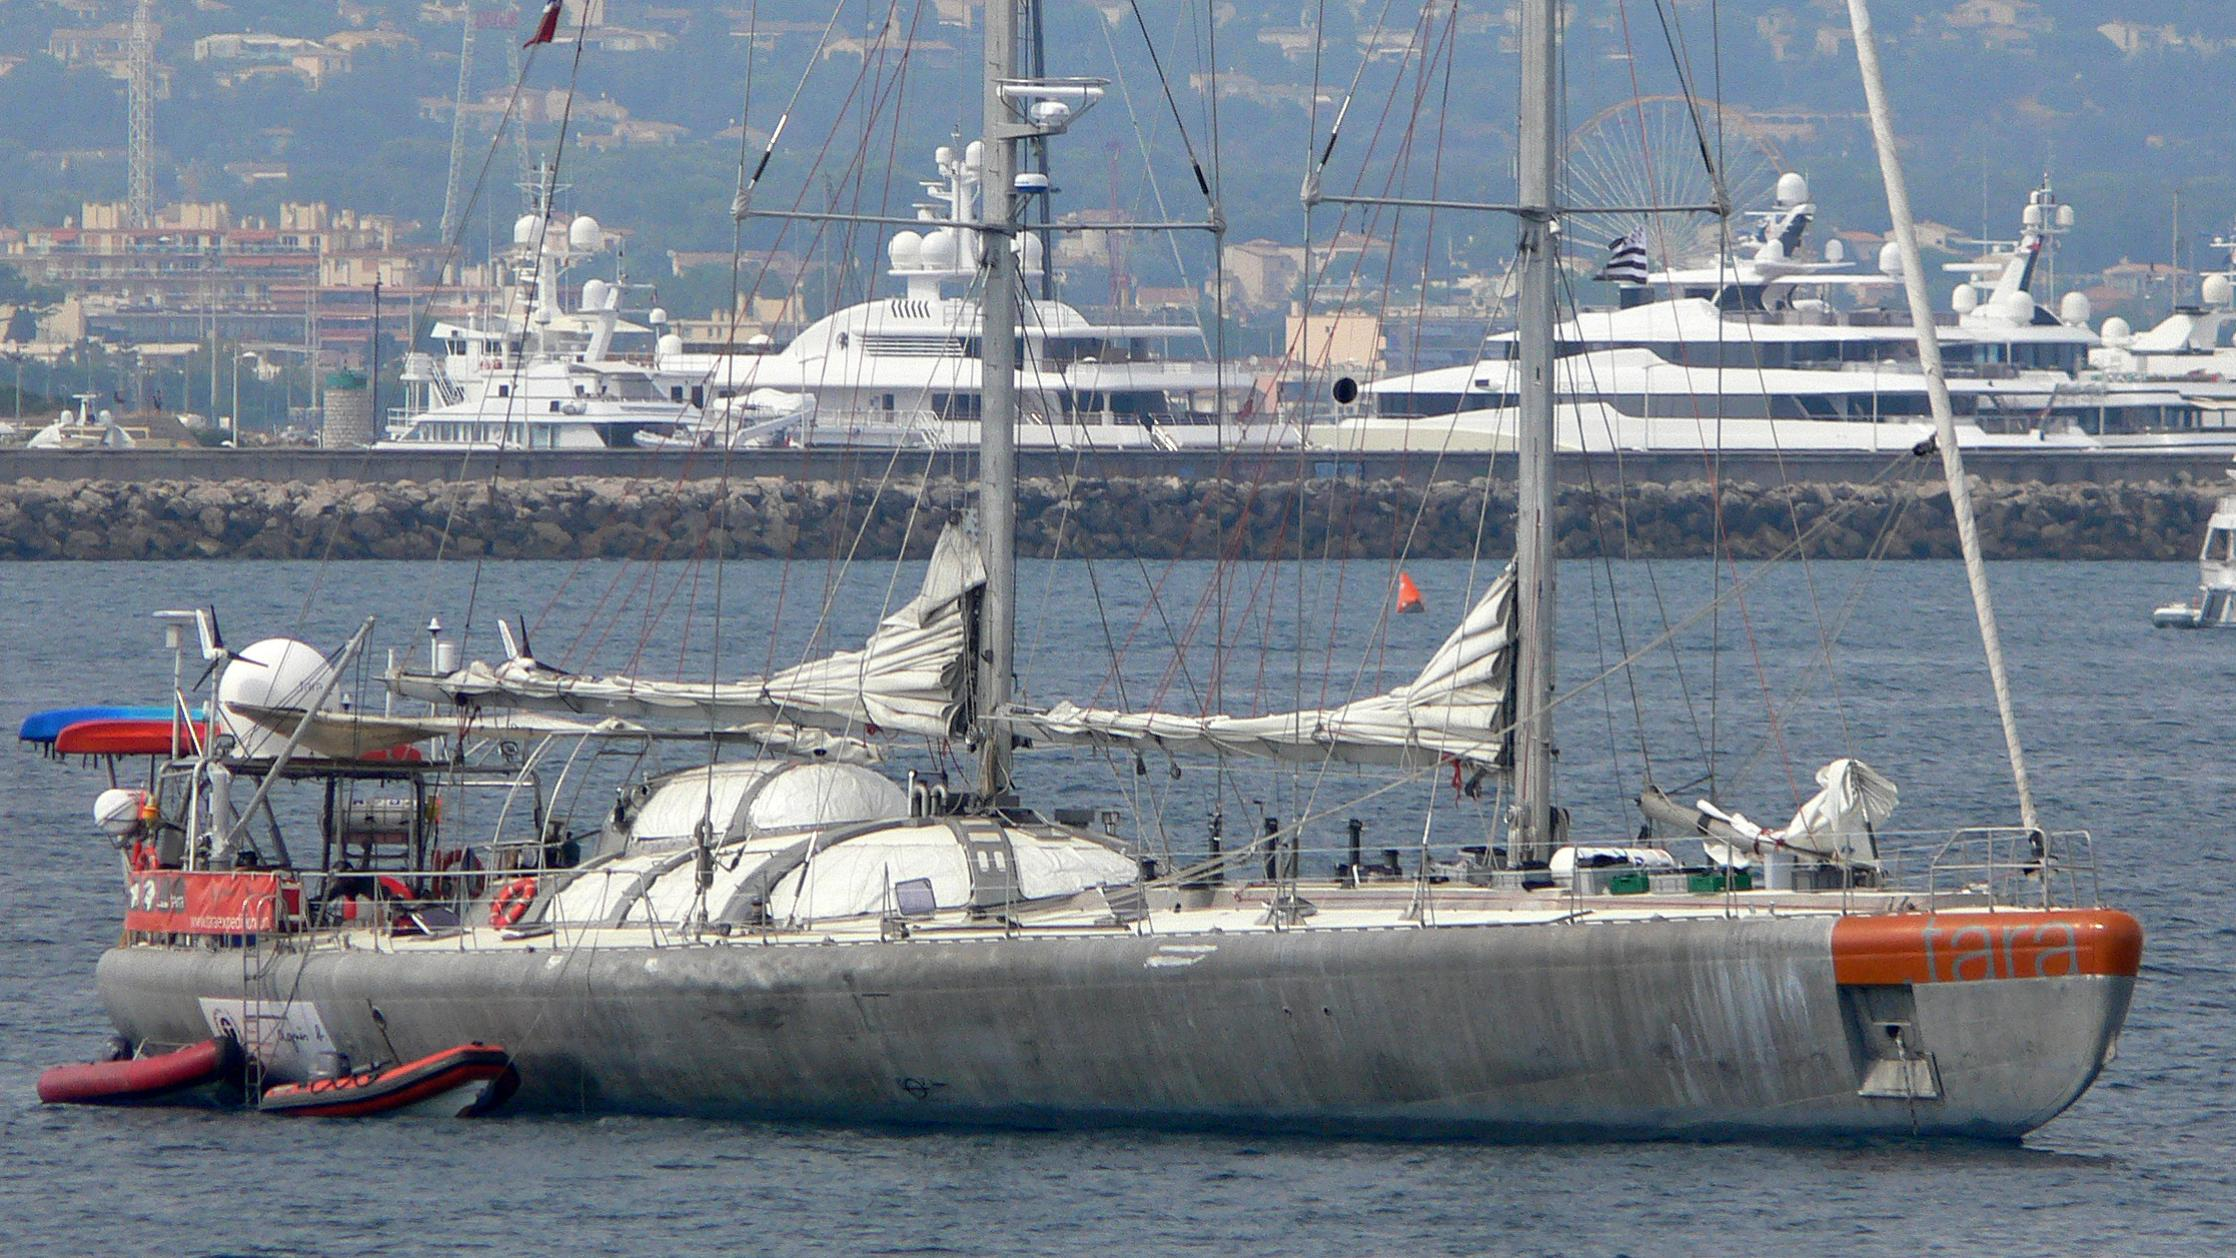 tara-half-sailing-yacht-sfcn-1989-36m-anchored